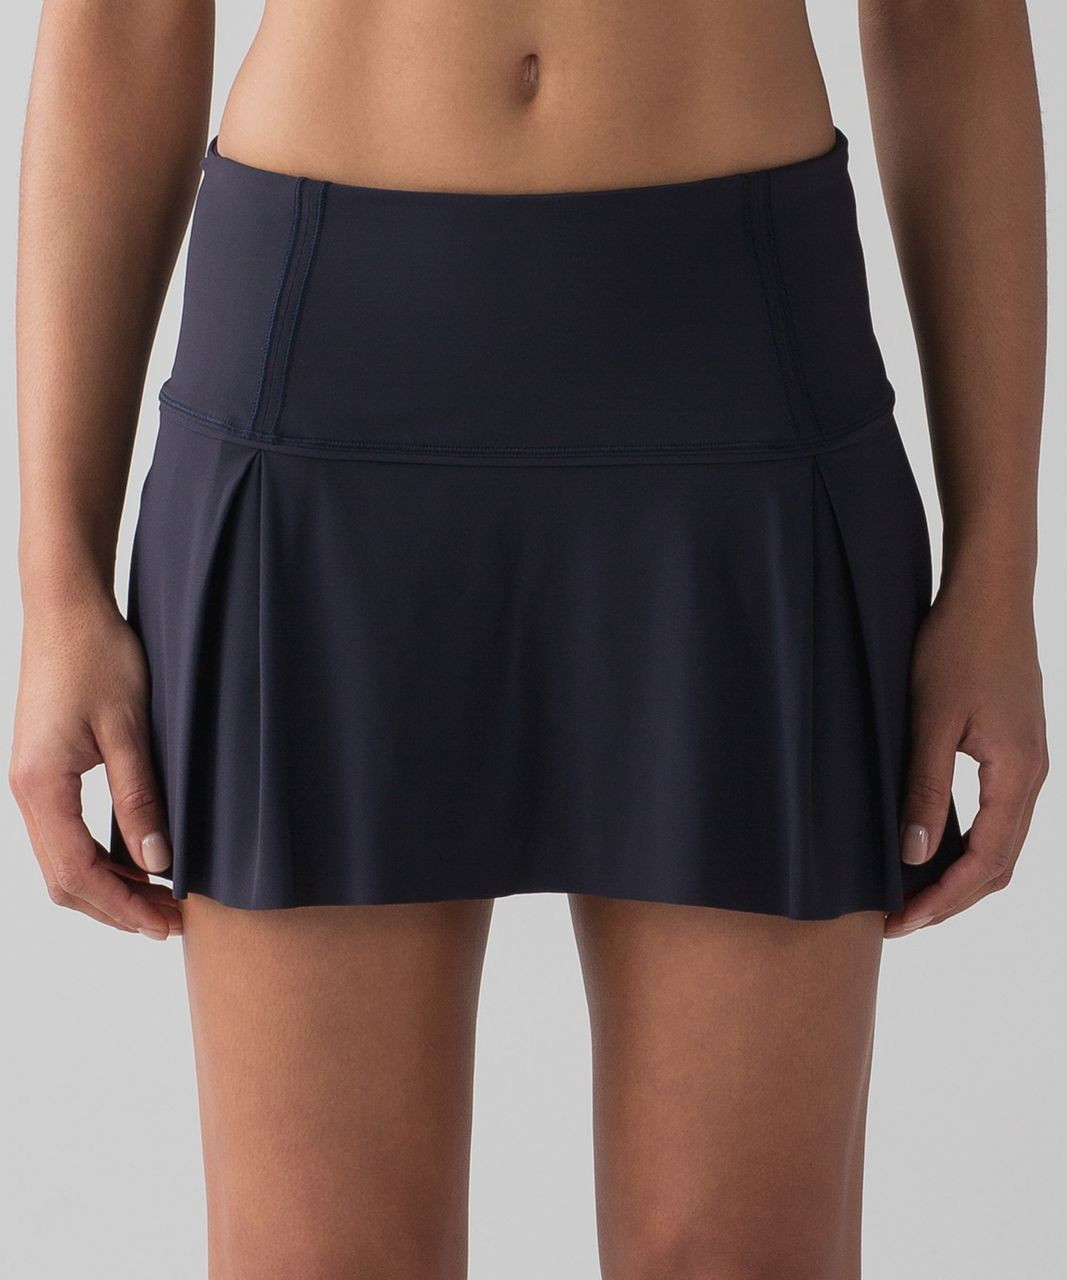 "Lululemon Lost In Pace Skirt (Regular) (13"") - Midnight Navy"